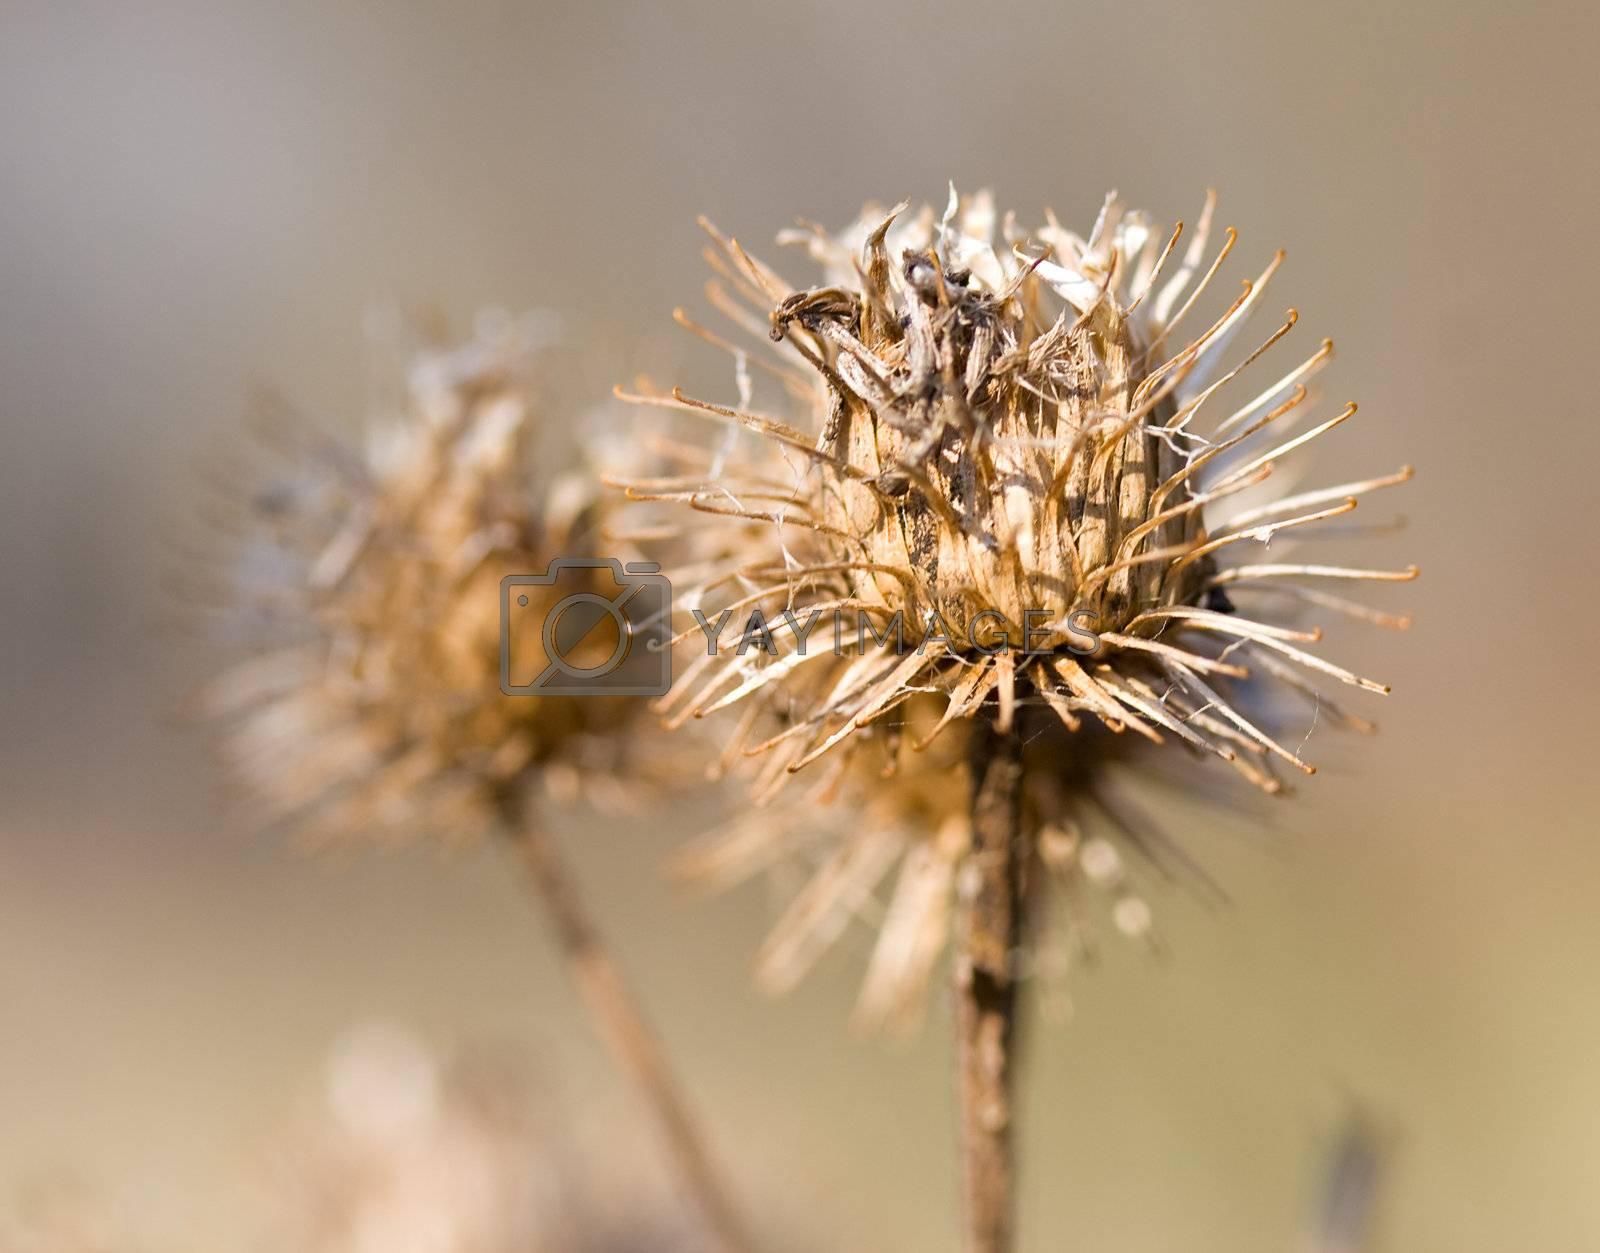 close-up dry burdock bush, selective focus